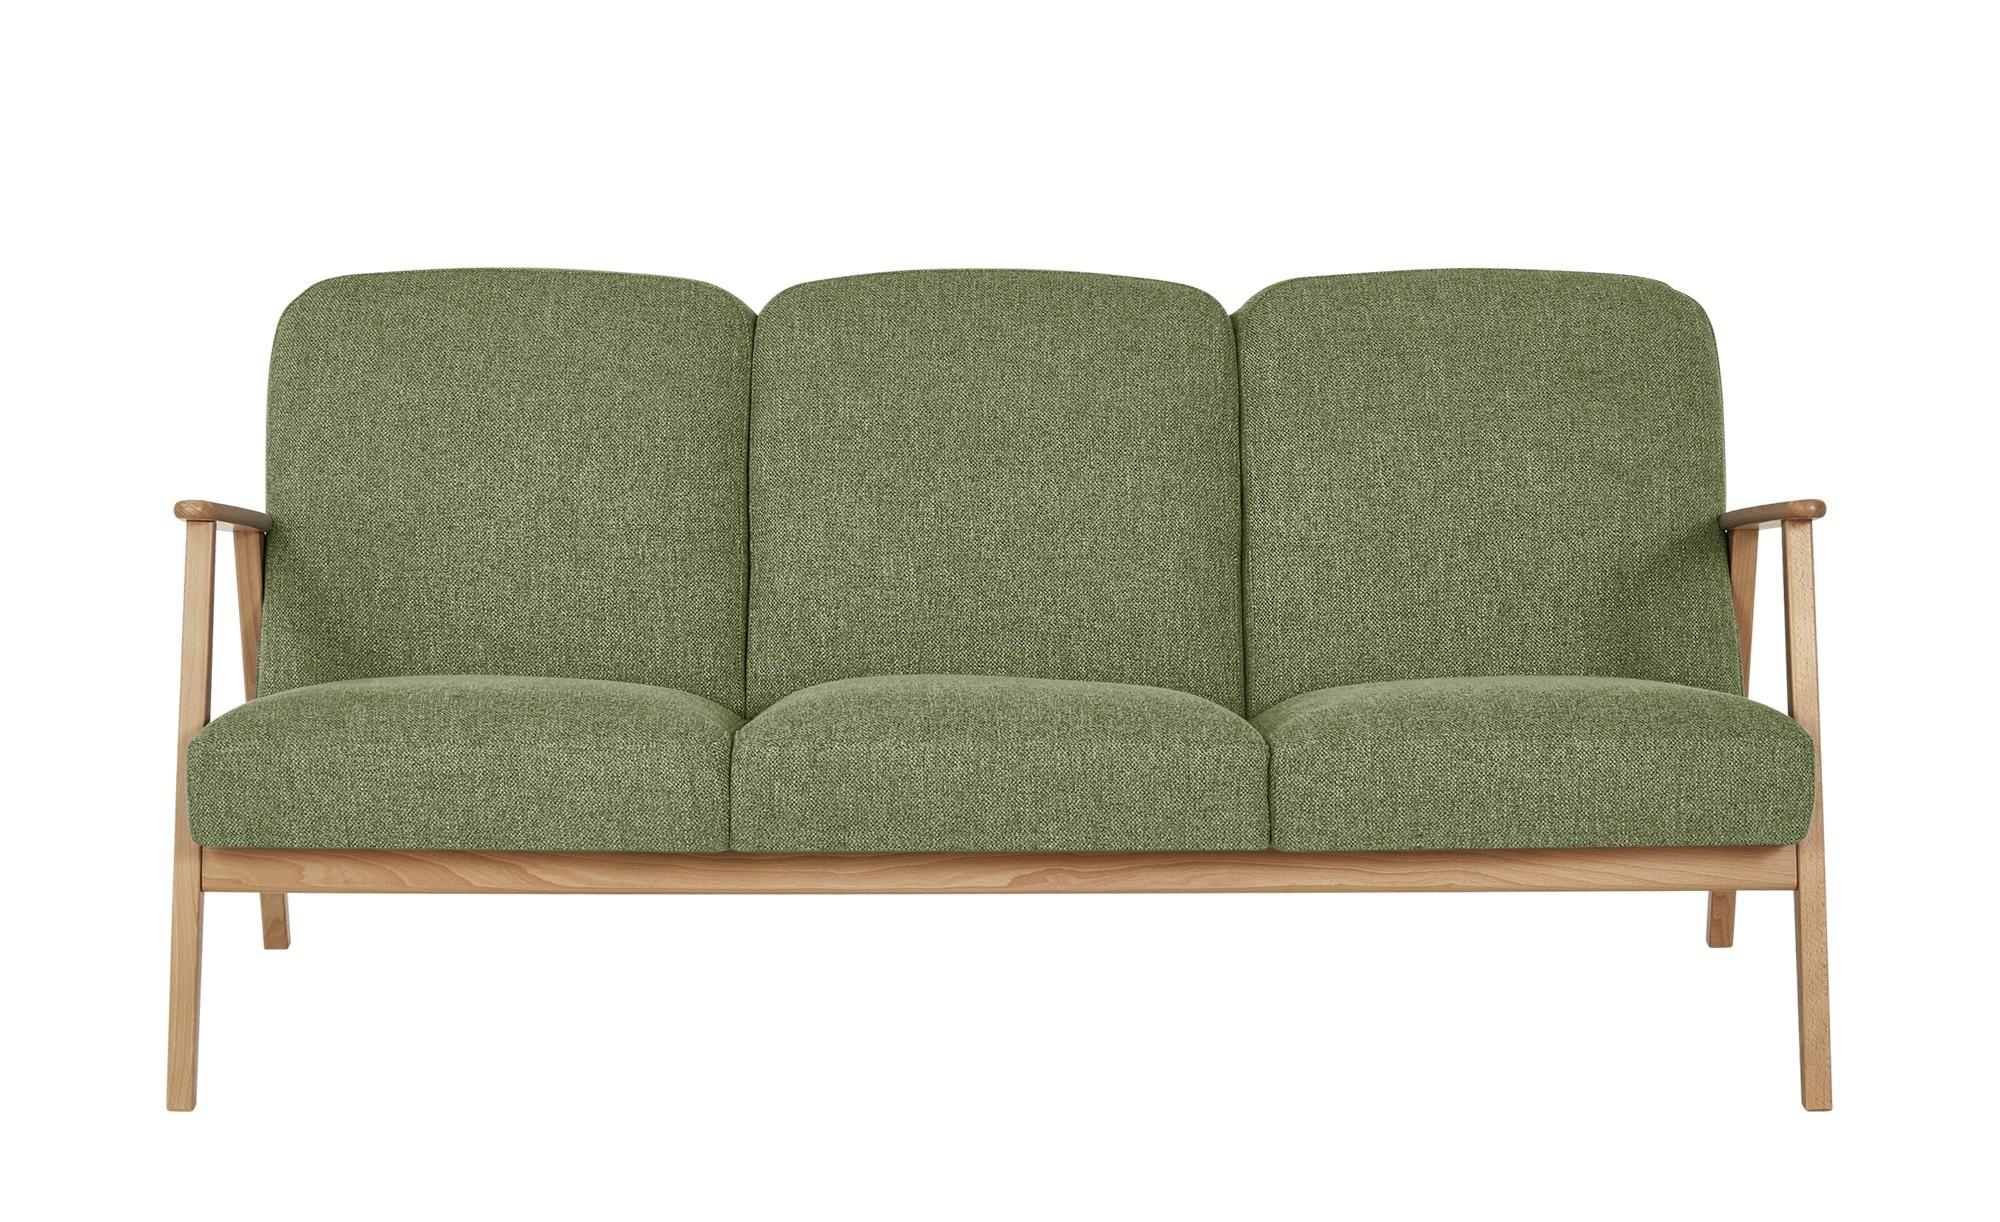 Smart Sofa Rada In 2019 Sofa Design Gunstige Sofas Und Big Sofa Kaufen